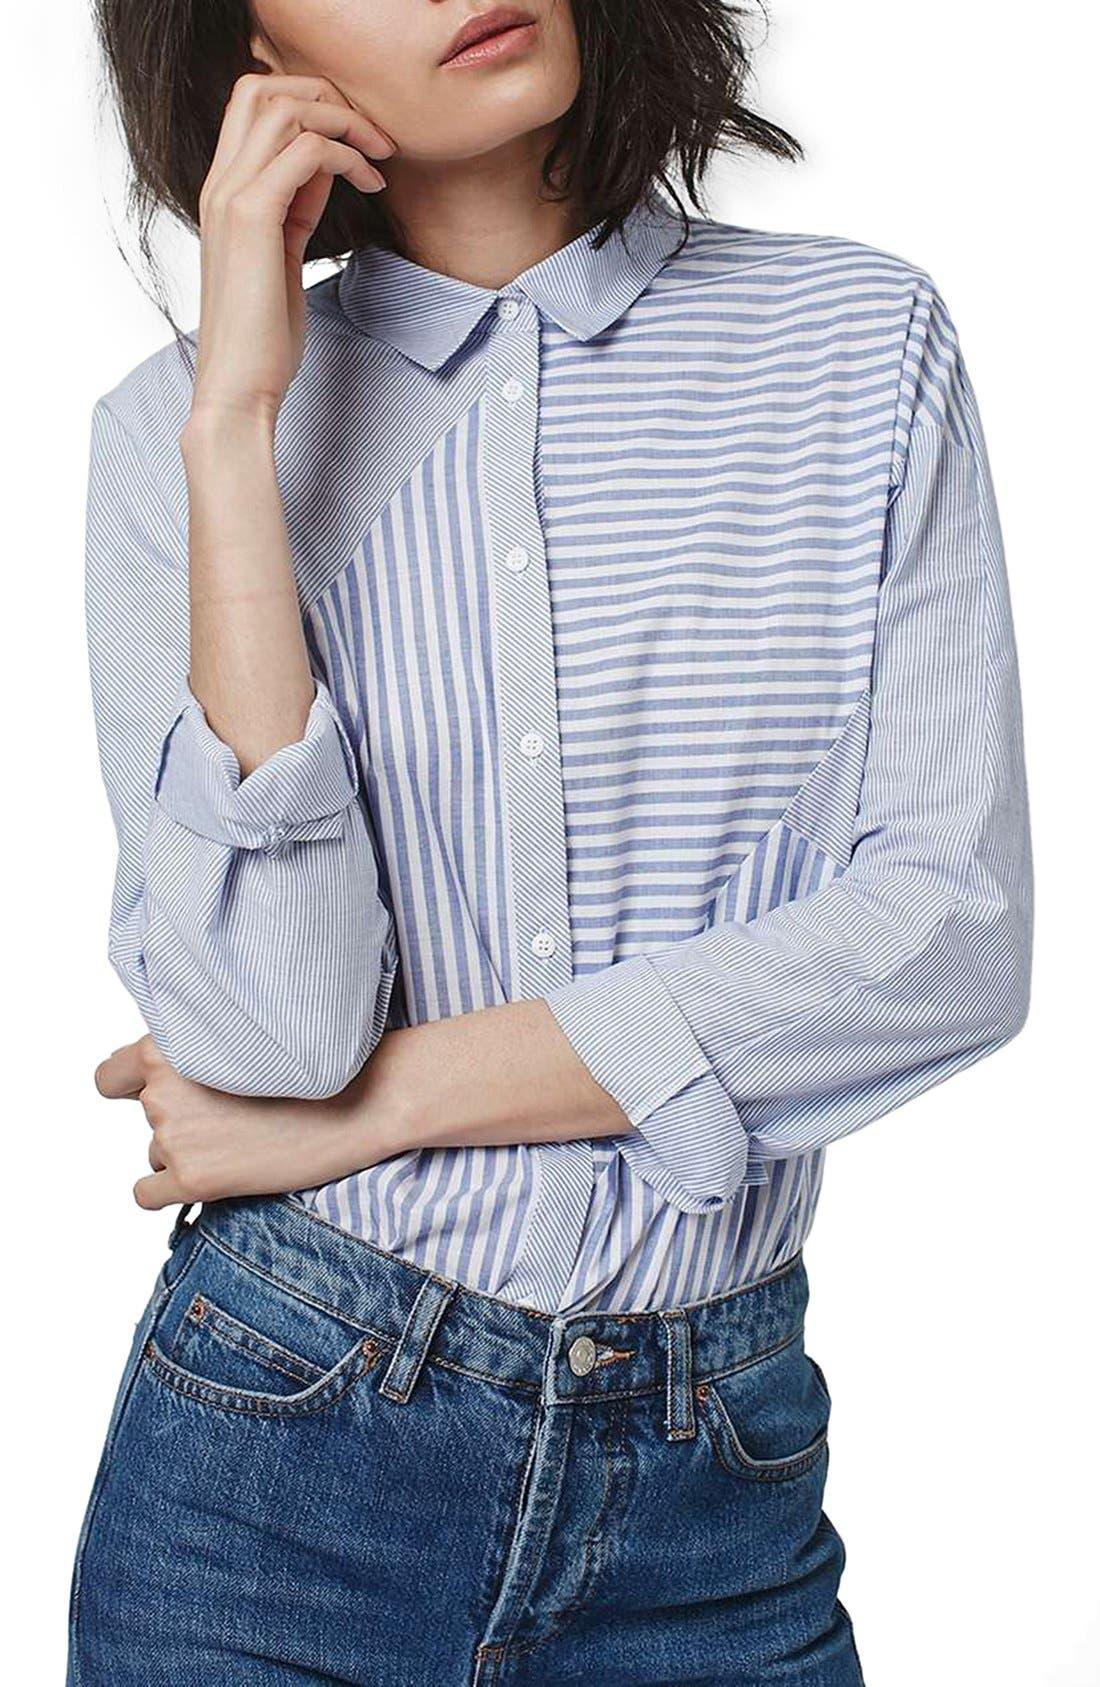 Main Image - Topshop 'Harper' Mixed Stripe Shirt